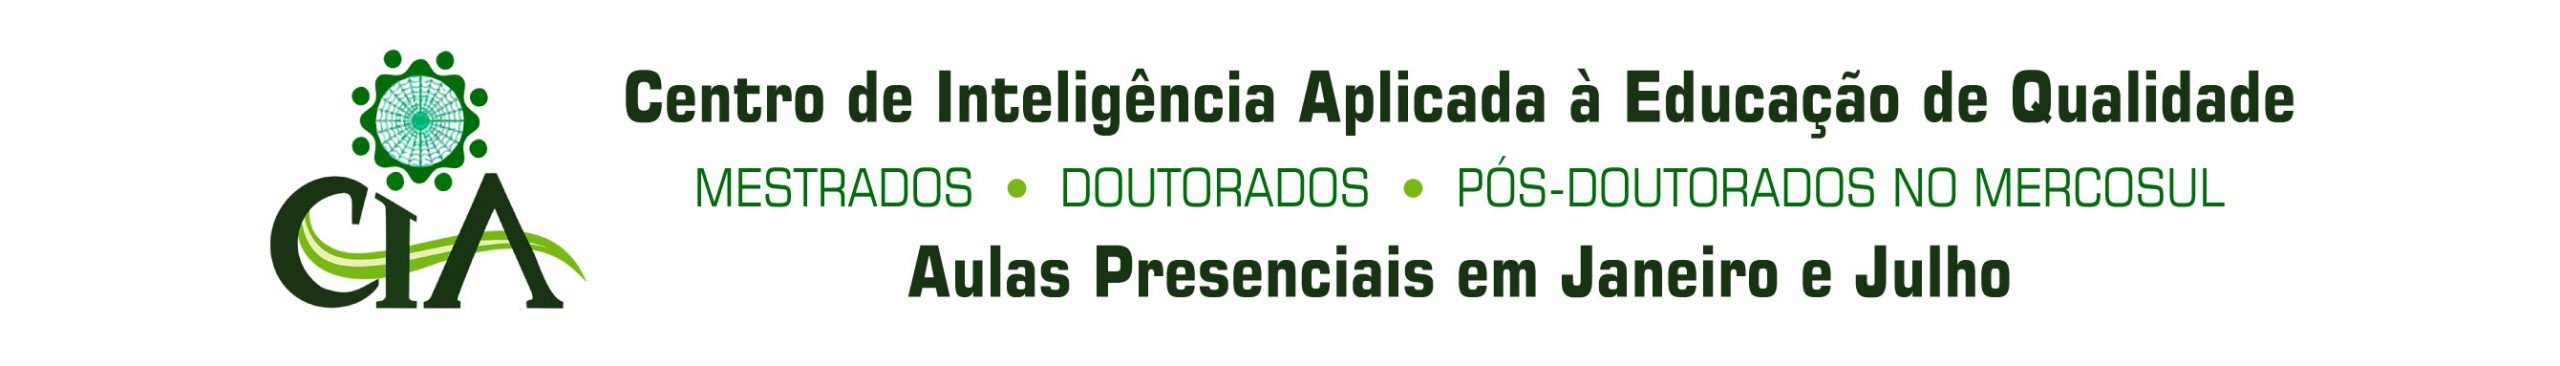 Mestrados e Doutorados no Mercosul